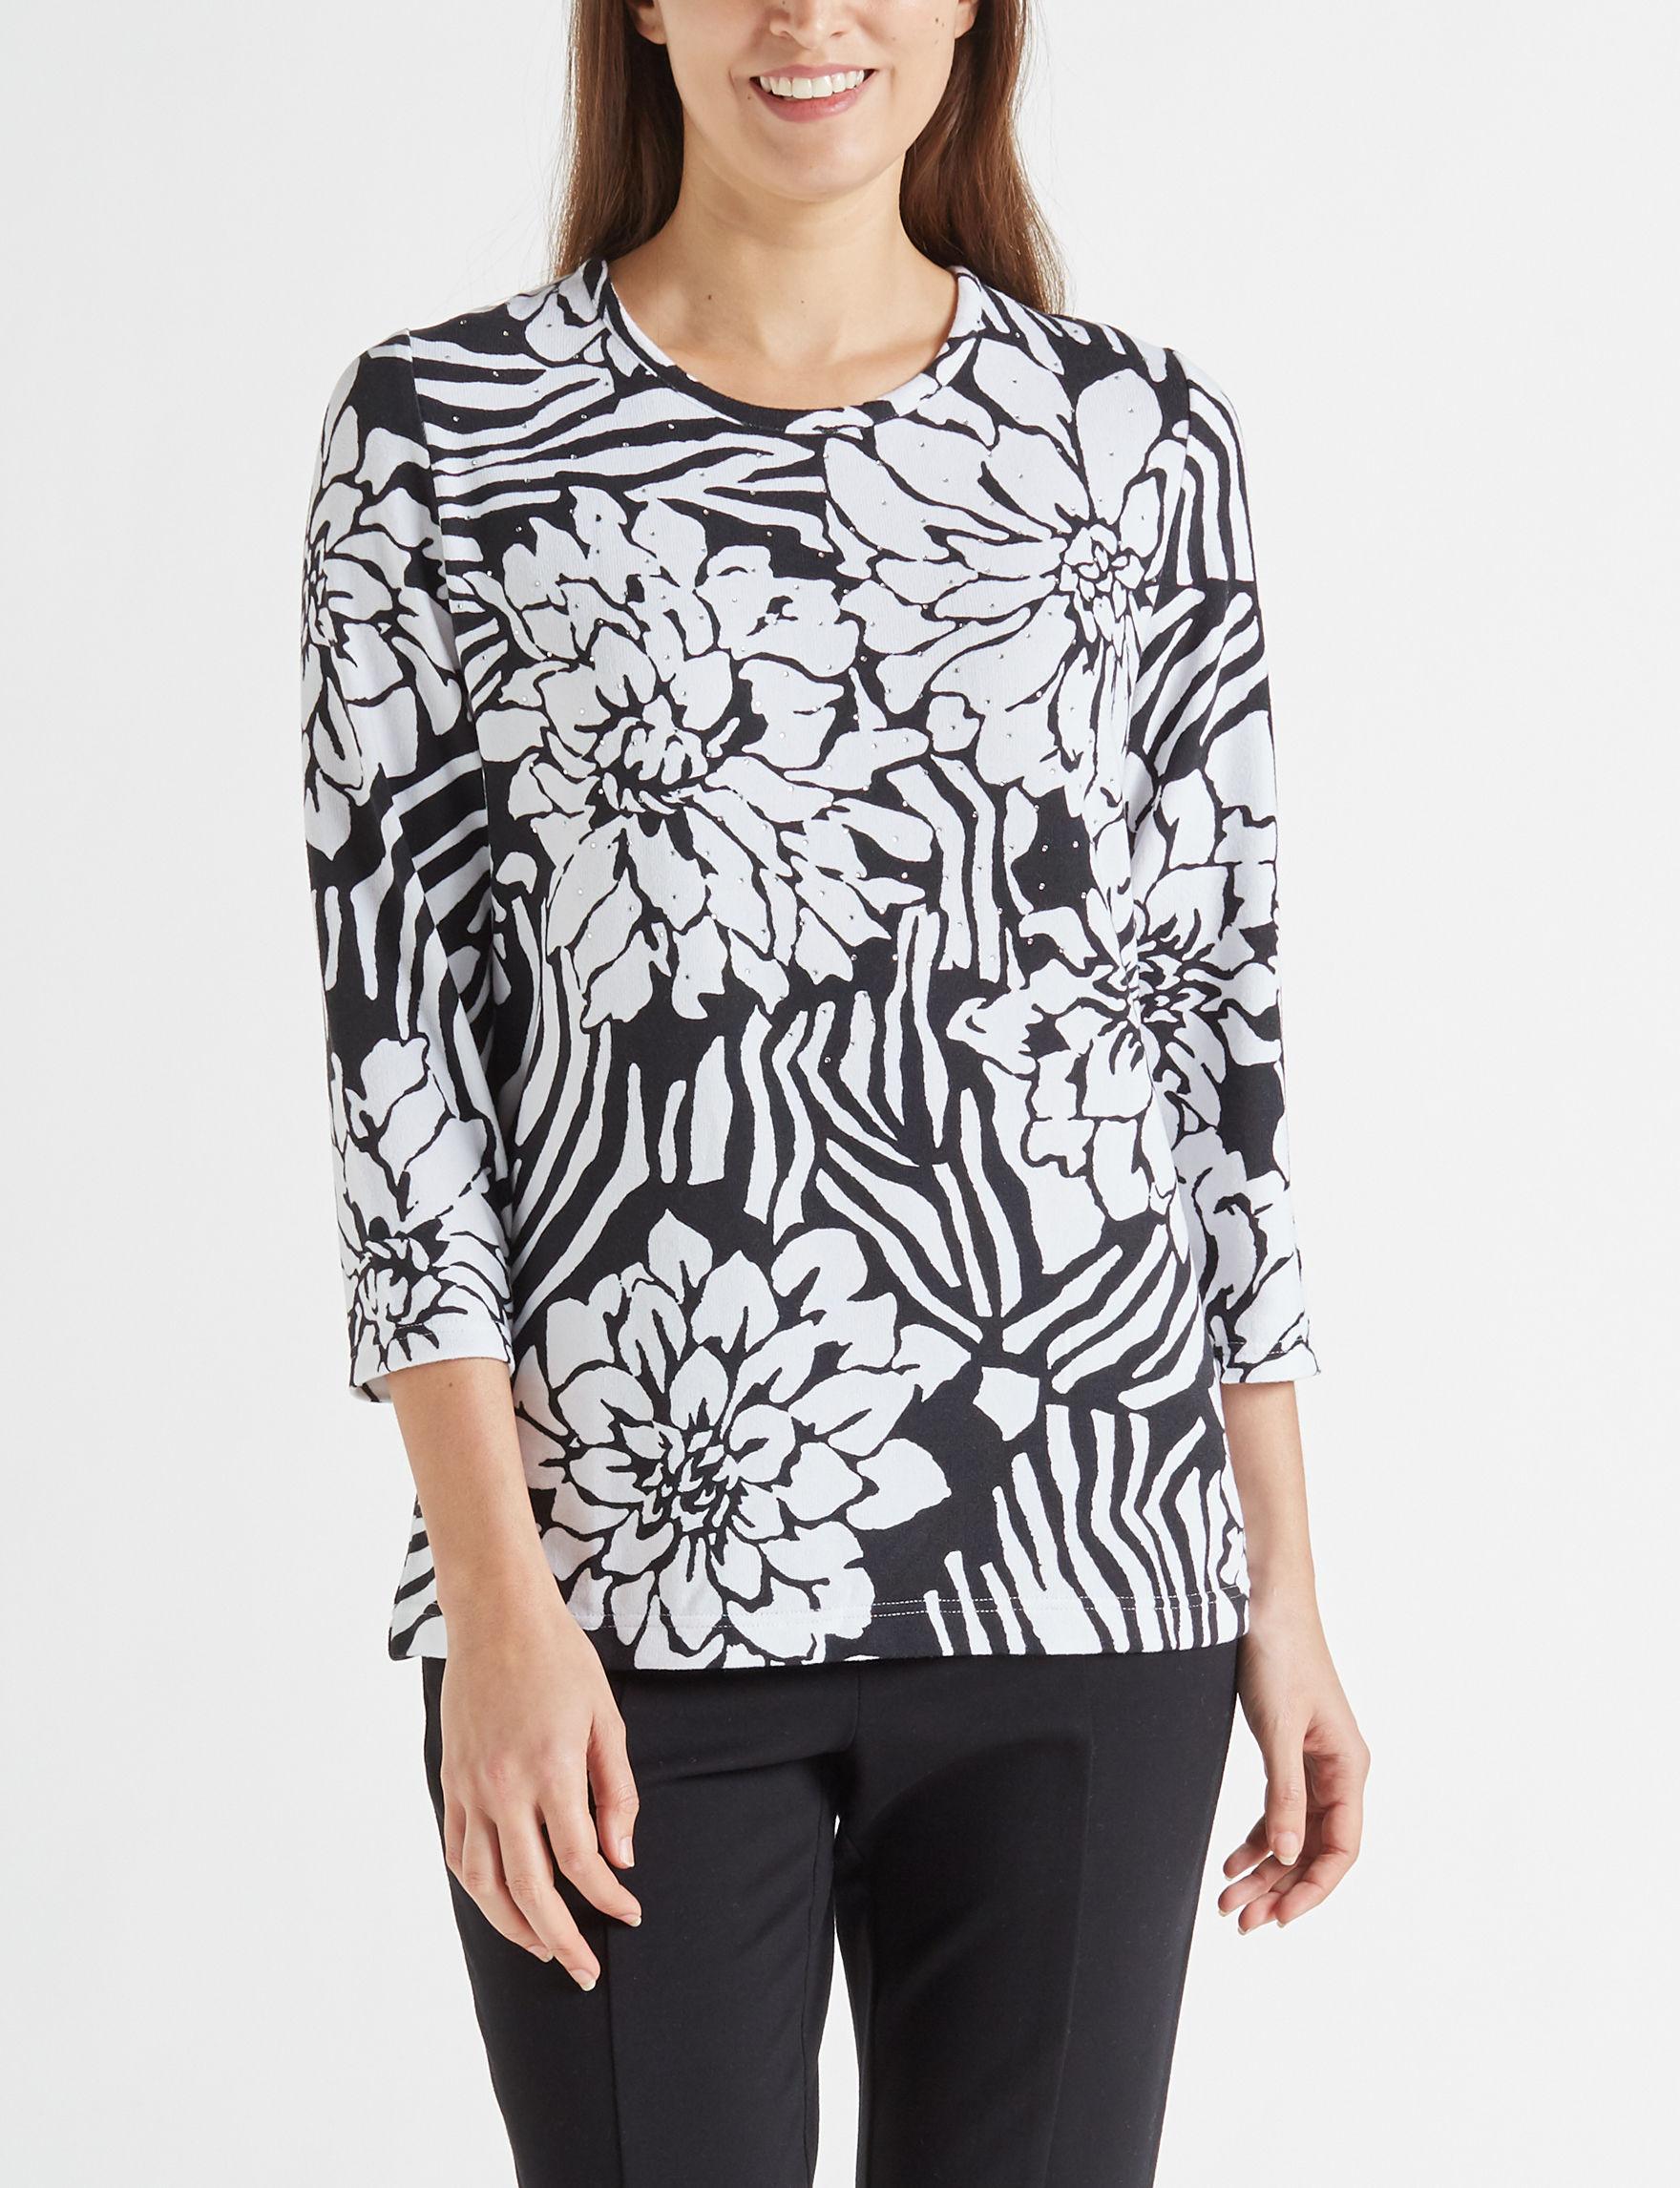 Rebecca Malone Black / White Shirts & Blouses